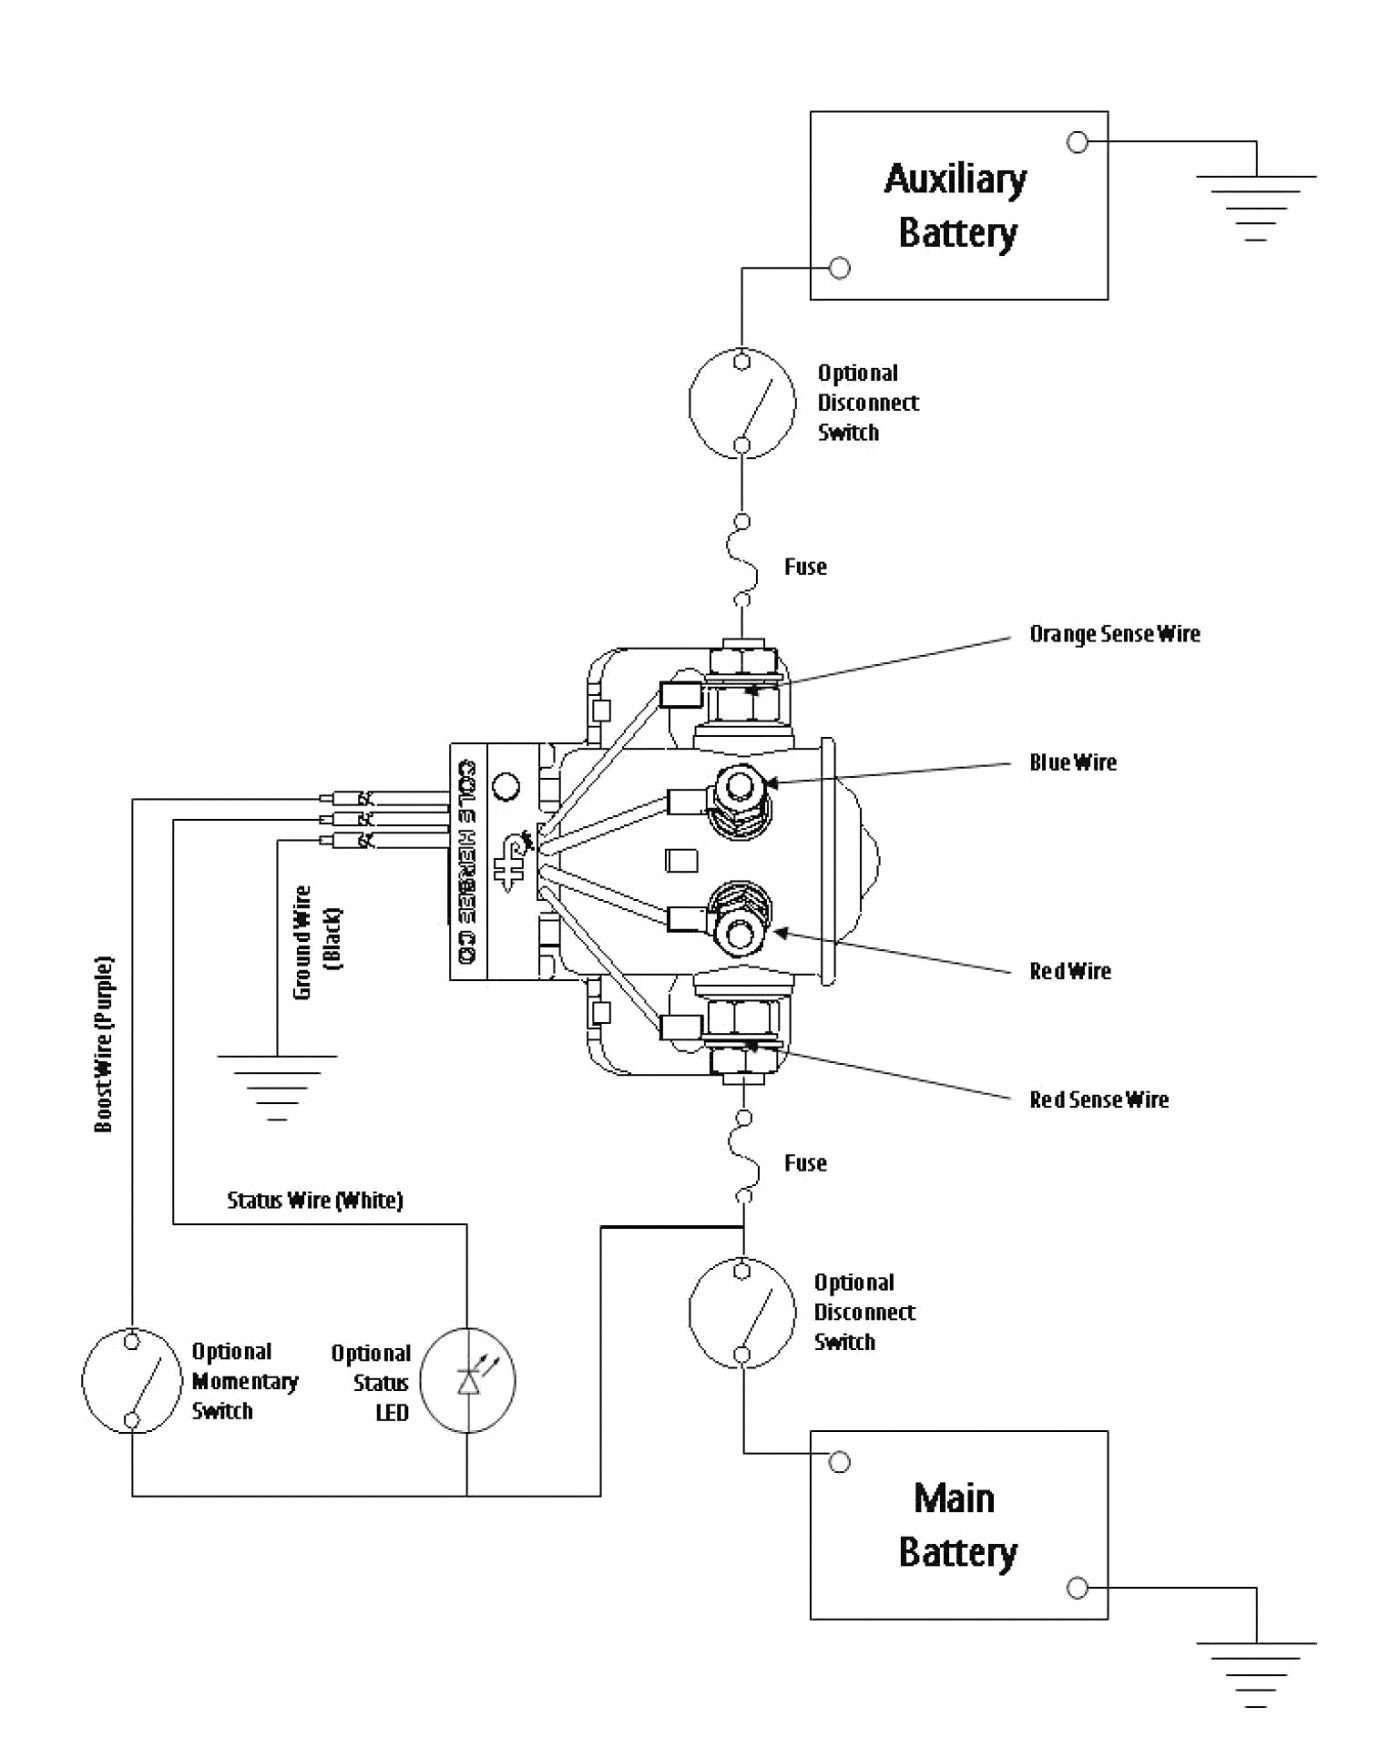 Dual Battery Switch Wiring Diagram Fresh Dual Rv Battery Wiring Diagram Of Dual Battery Switch Wiring Diagram